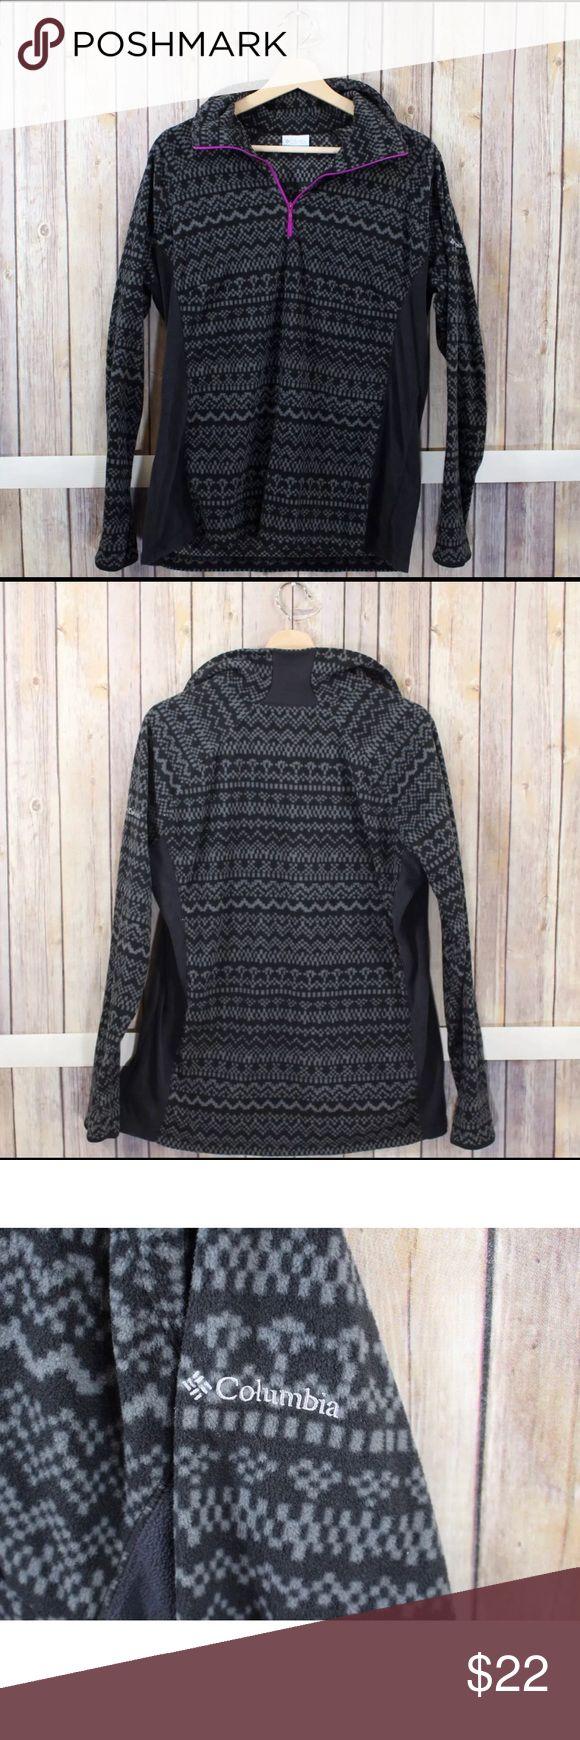 Columbia Sportswear Pullover Fleece size XL. Columbia Sportswear Black and Gray Pullover Fleece size XL. Columbia Tops Sweatshirts & Hoodies